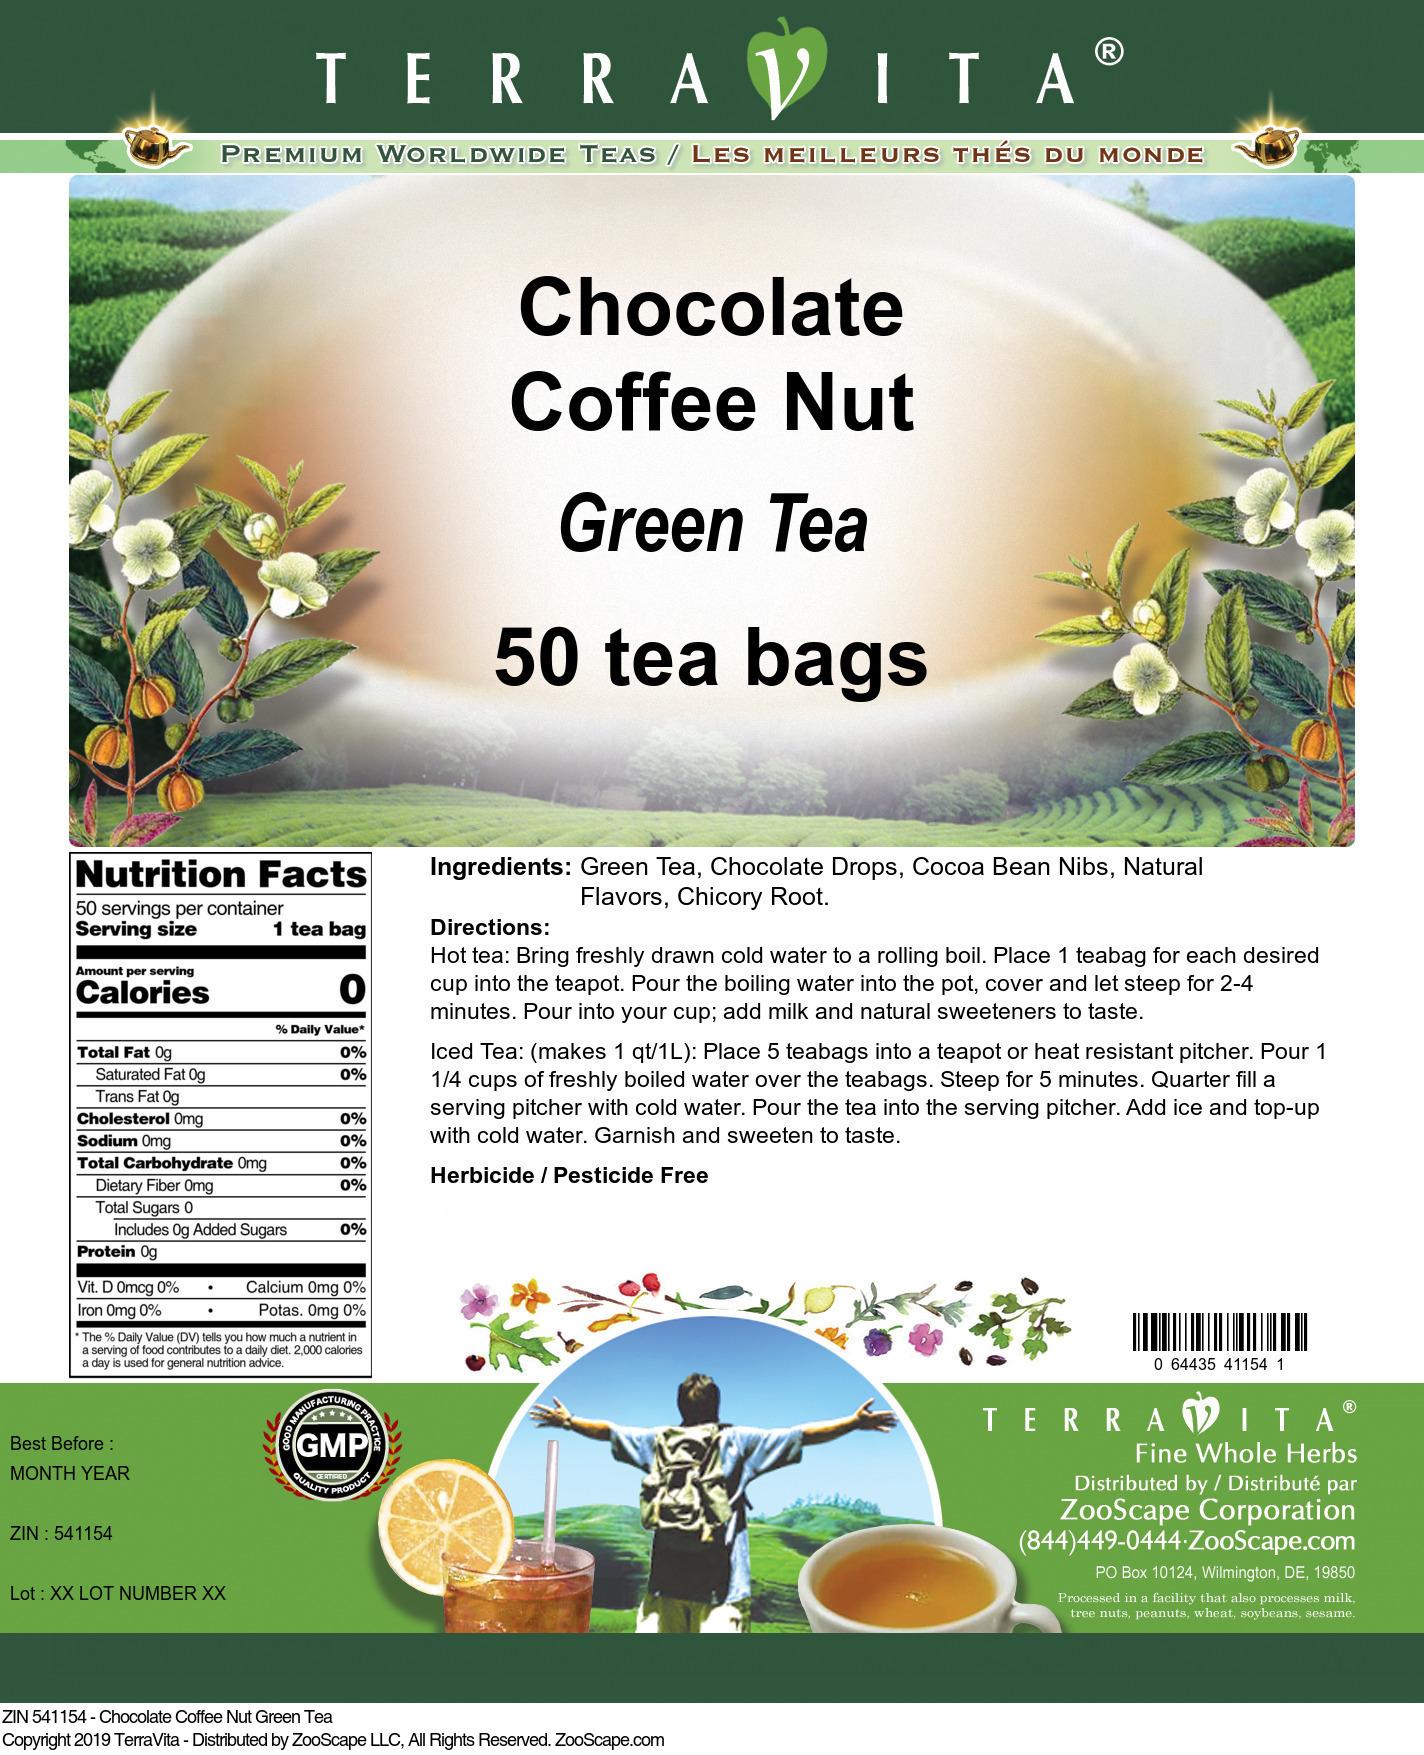 Chocolate Coffee Nut Green Tea